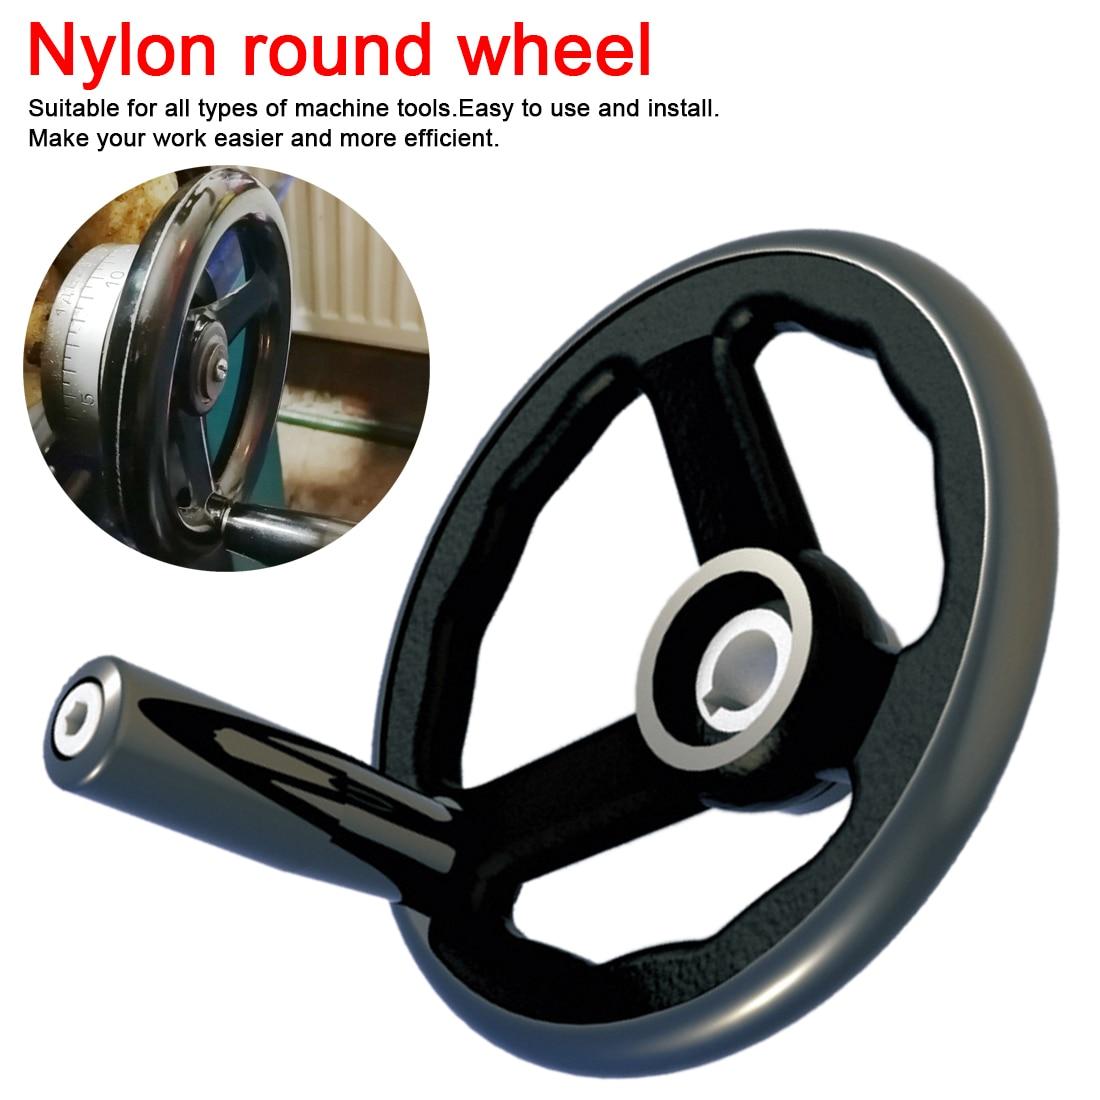 Black Milling Machine Lathe CNC 3D Printer Spoked Hand Wheel Wavy Round Bakelite Three Handwheel 100/125/160/200/250mm